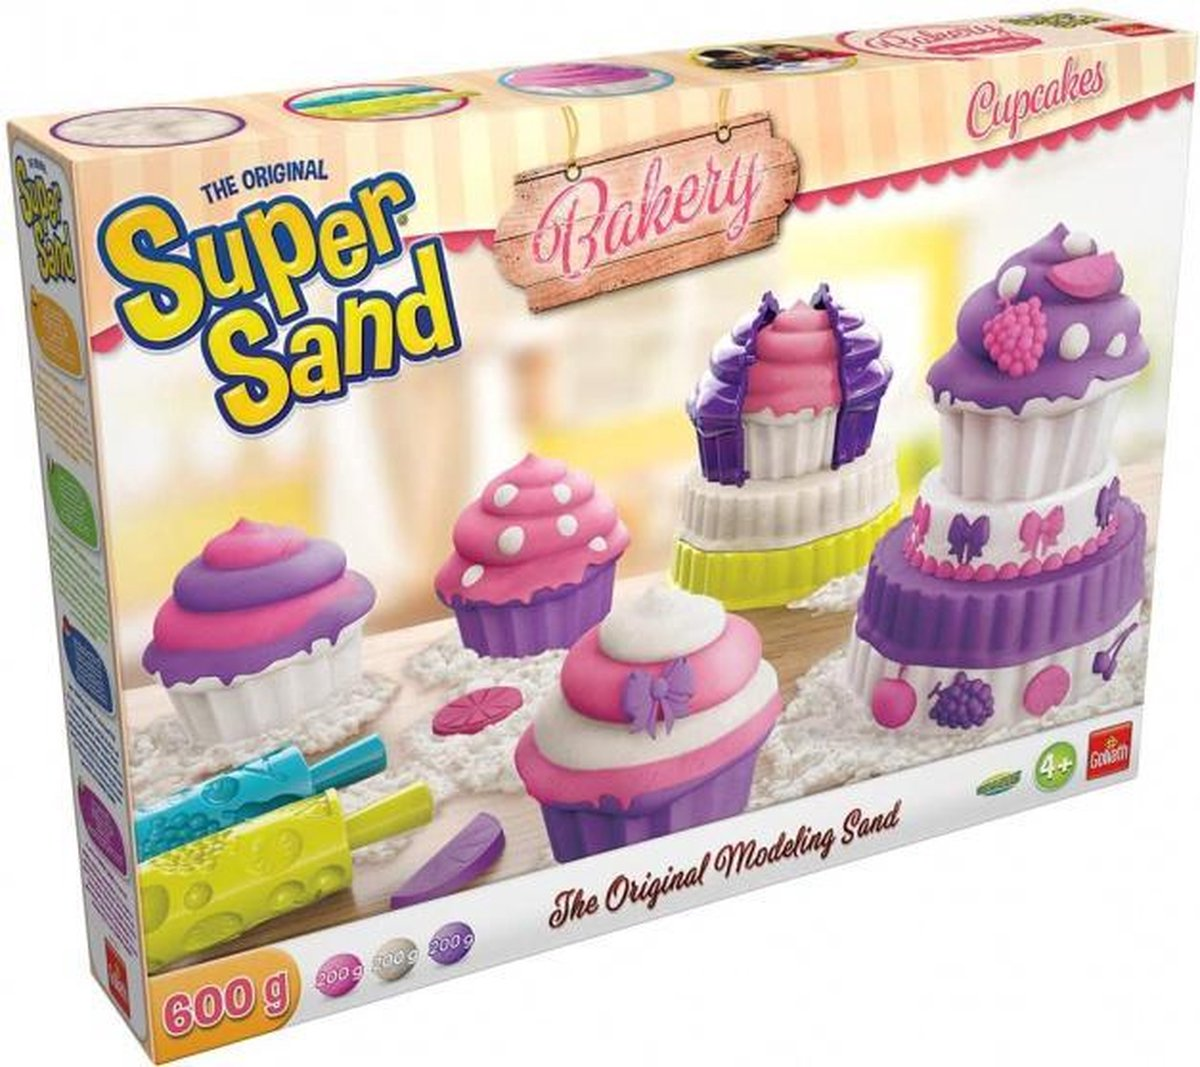 Super Sand Cupcakes speelzand